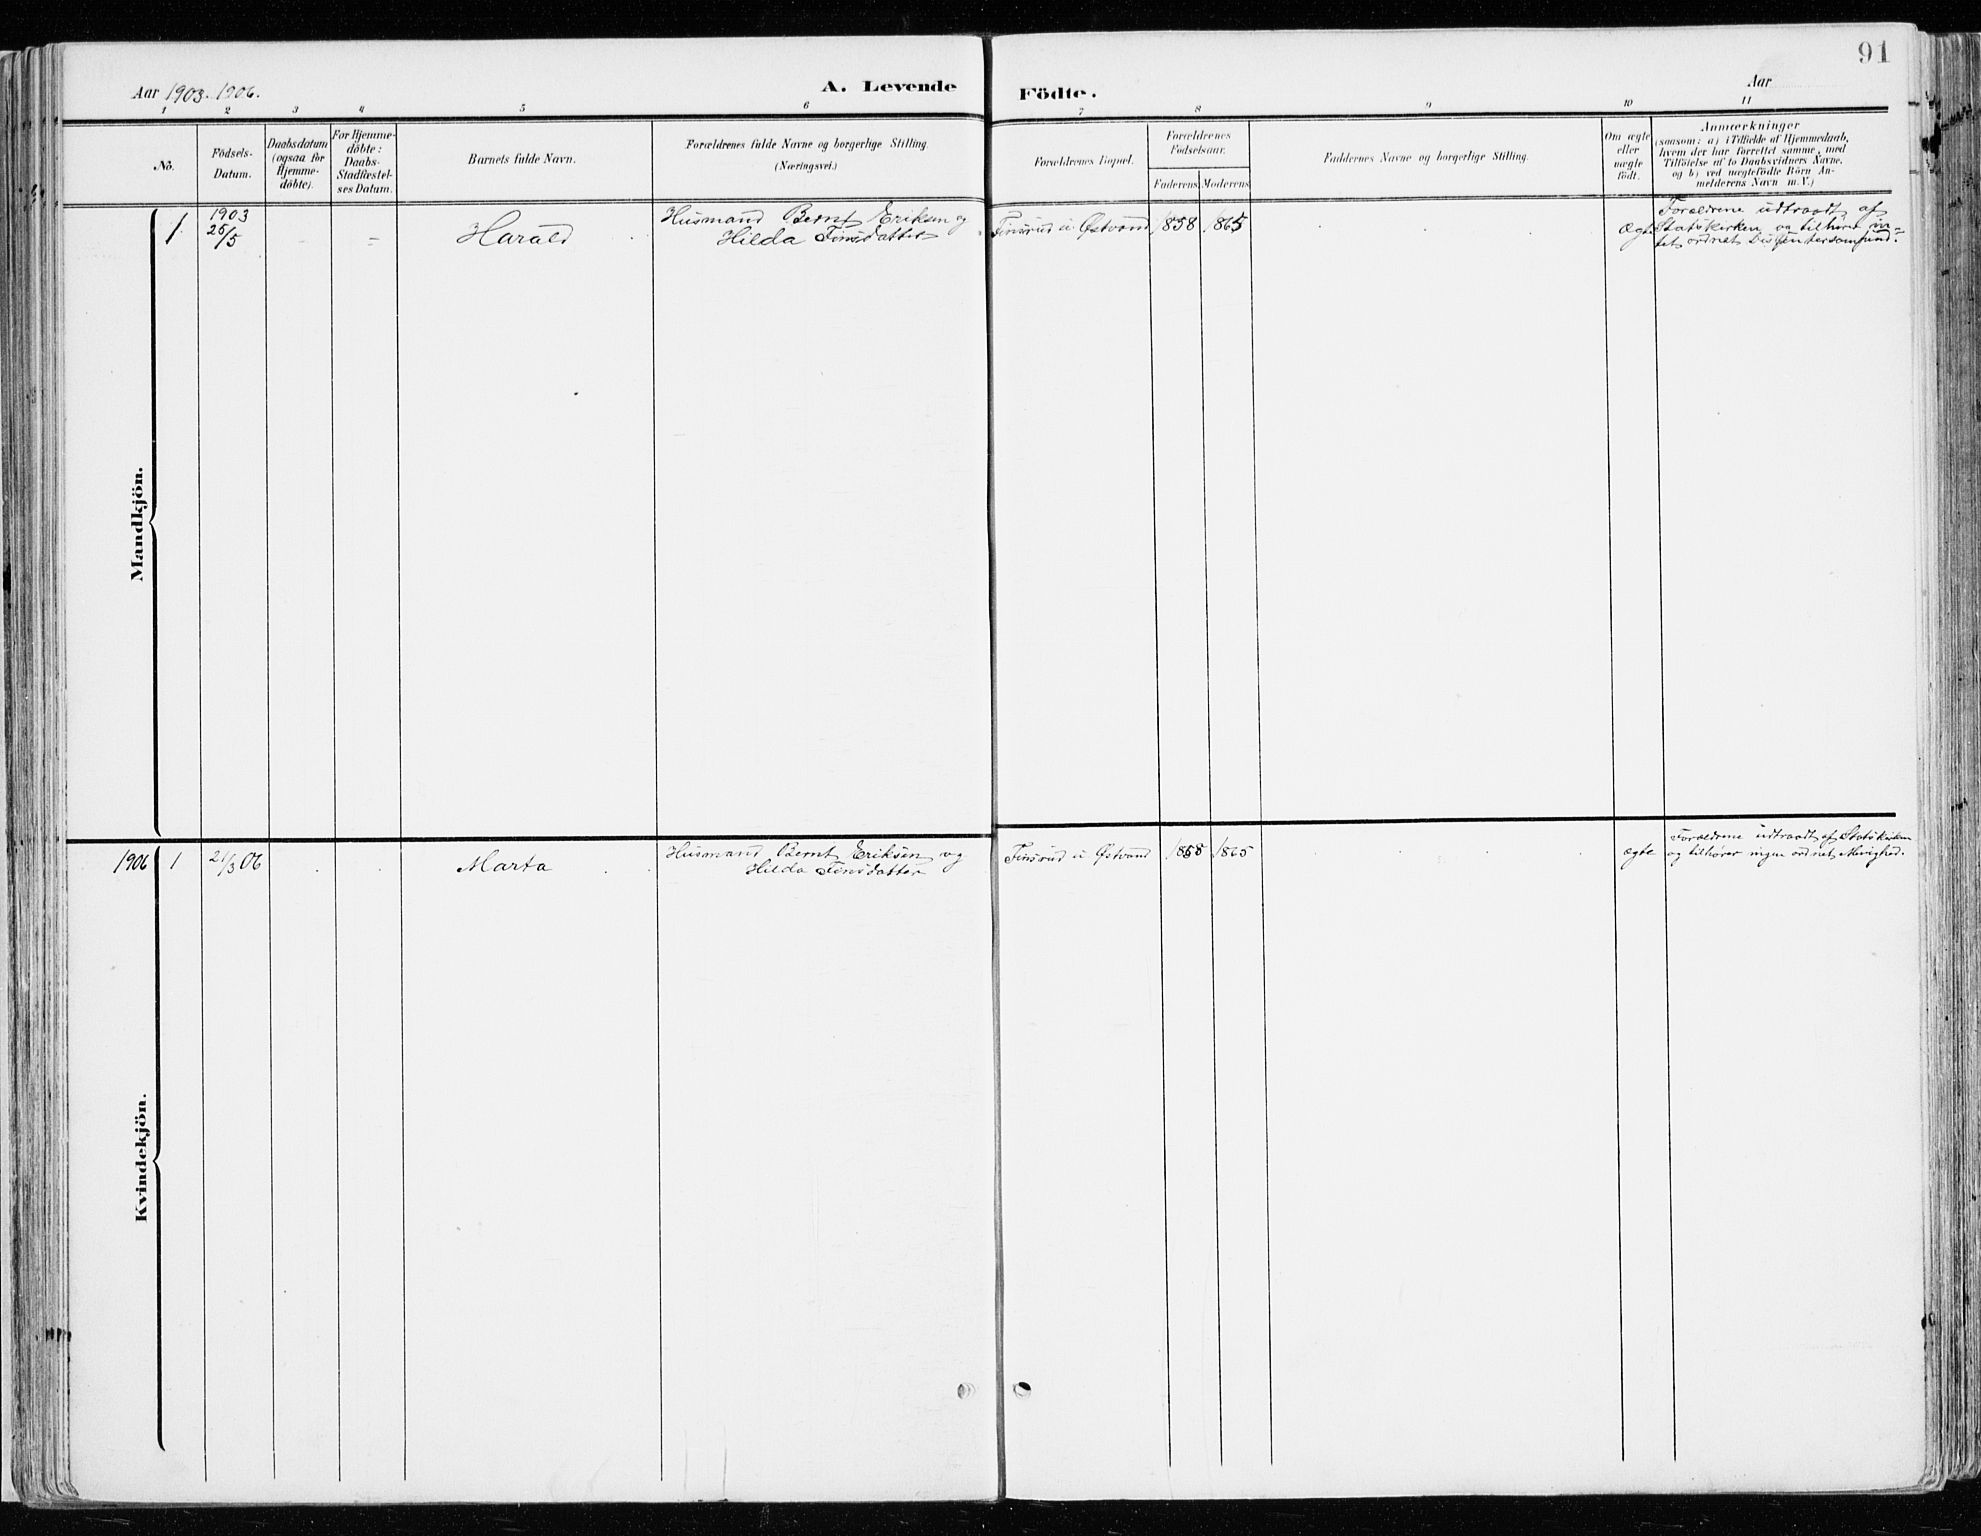 SAH, Nord-Odal prestekontor, Ministerialbok nr. 9, 1902-1926, s. 91